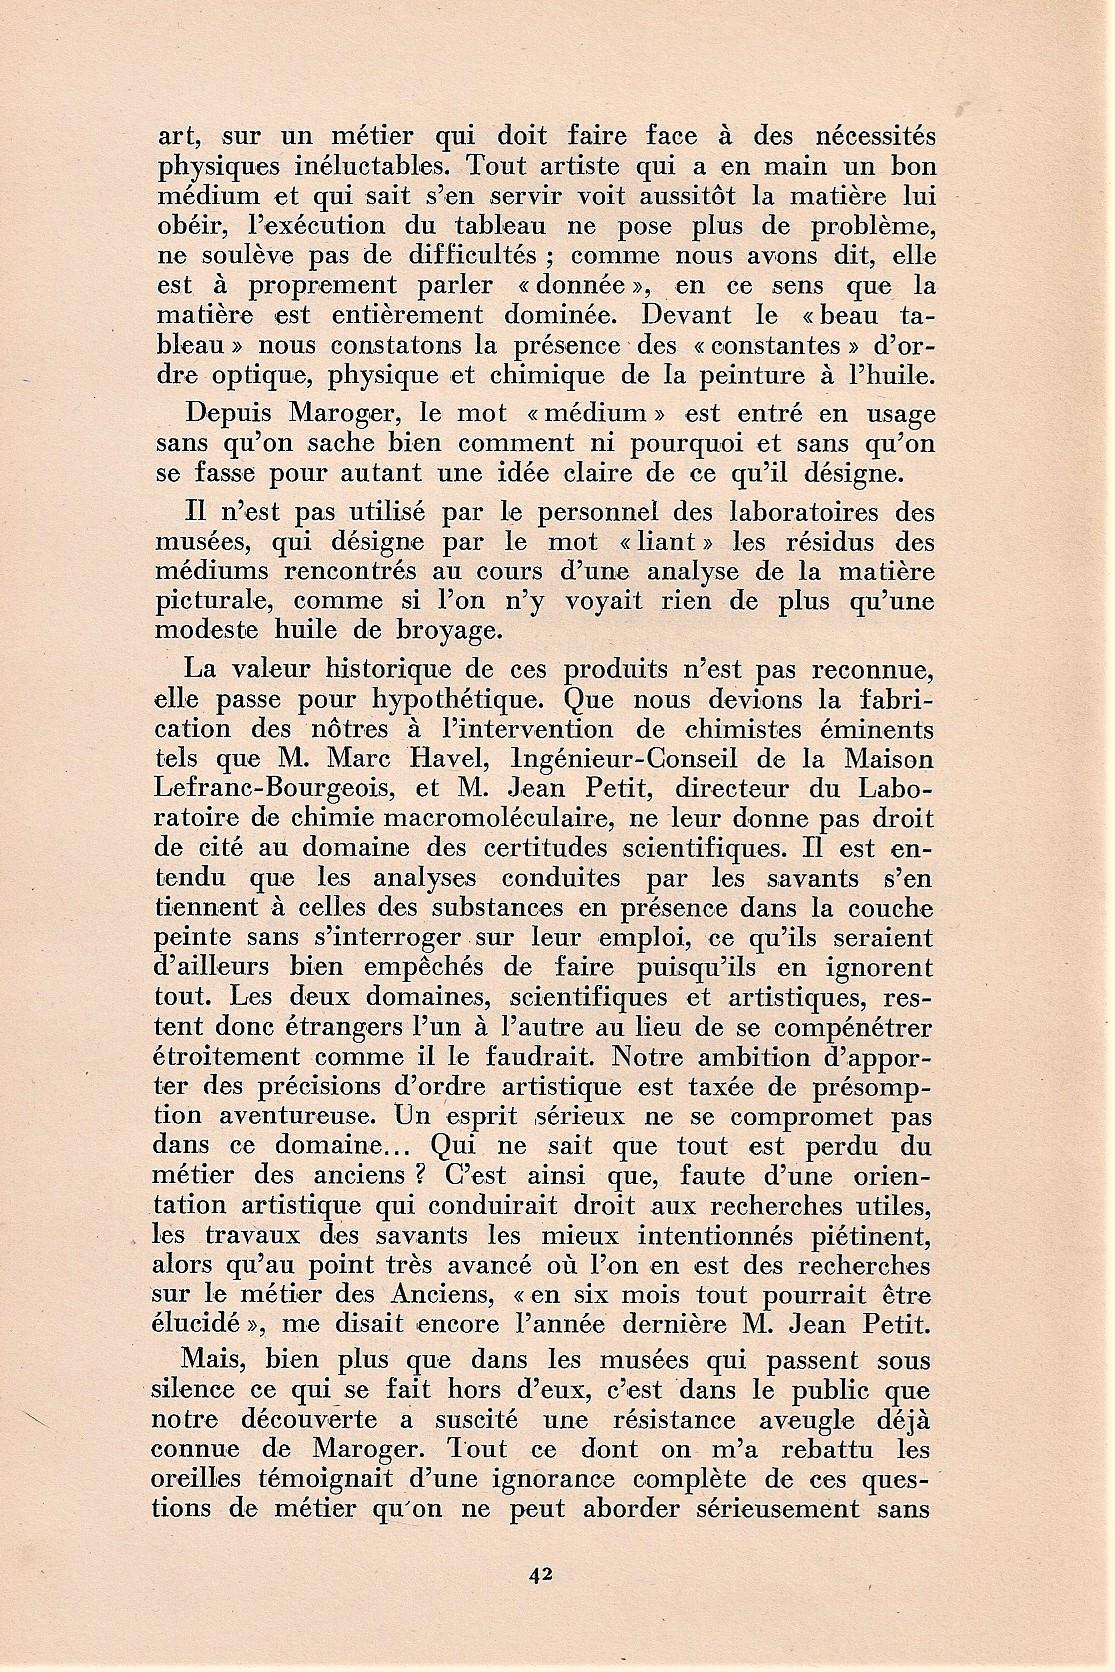 versini-page-42.jpg